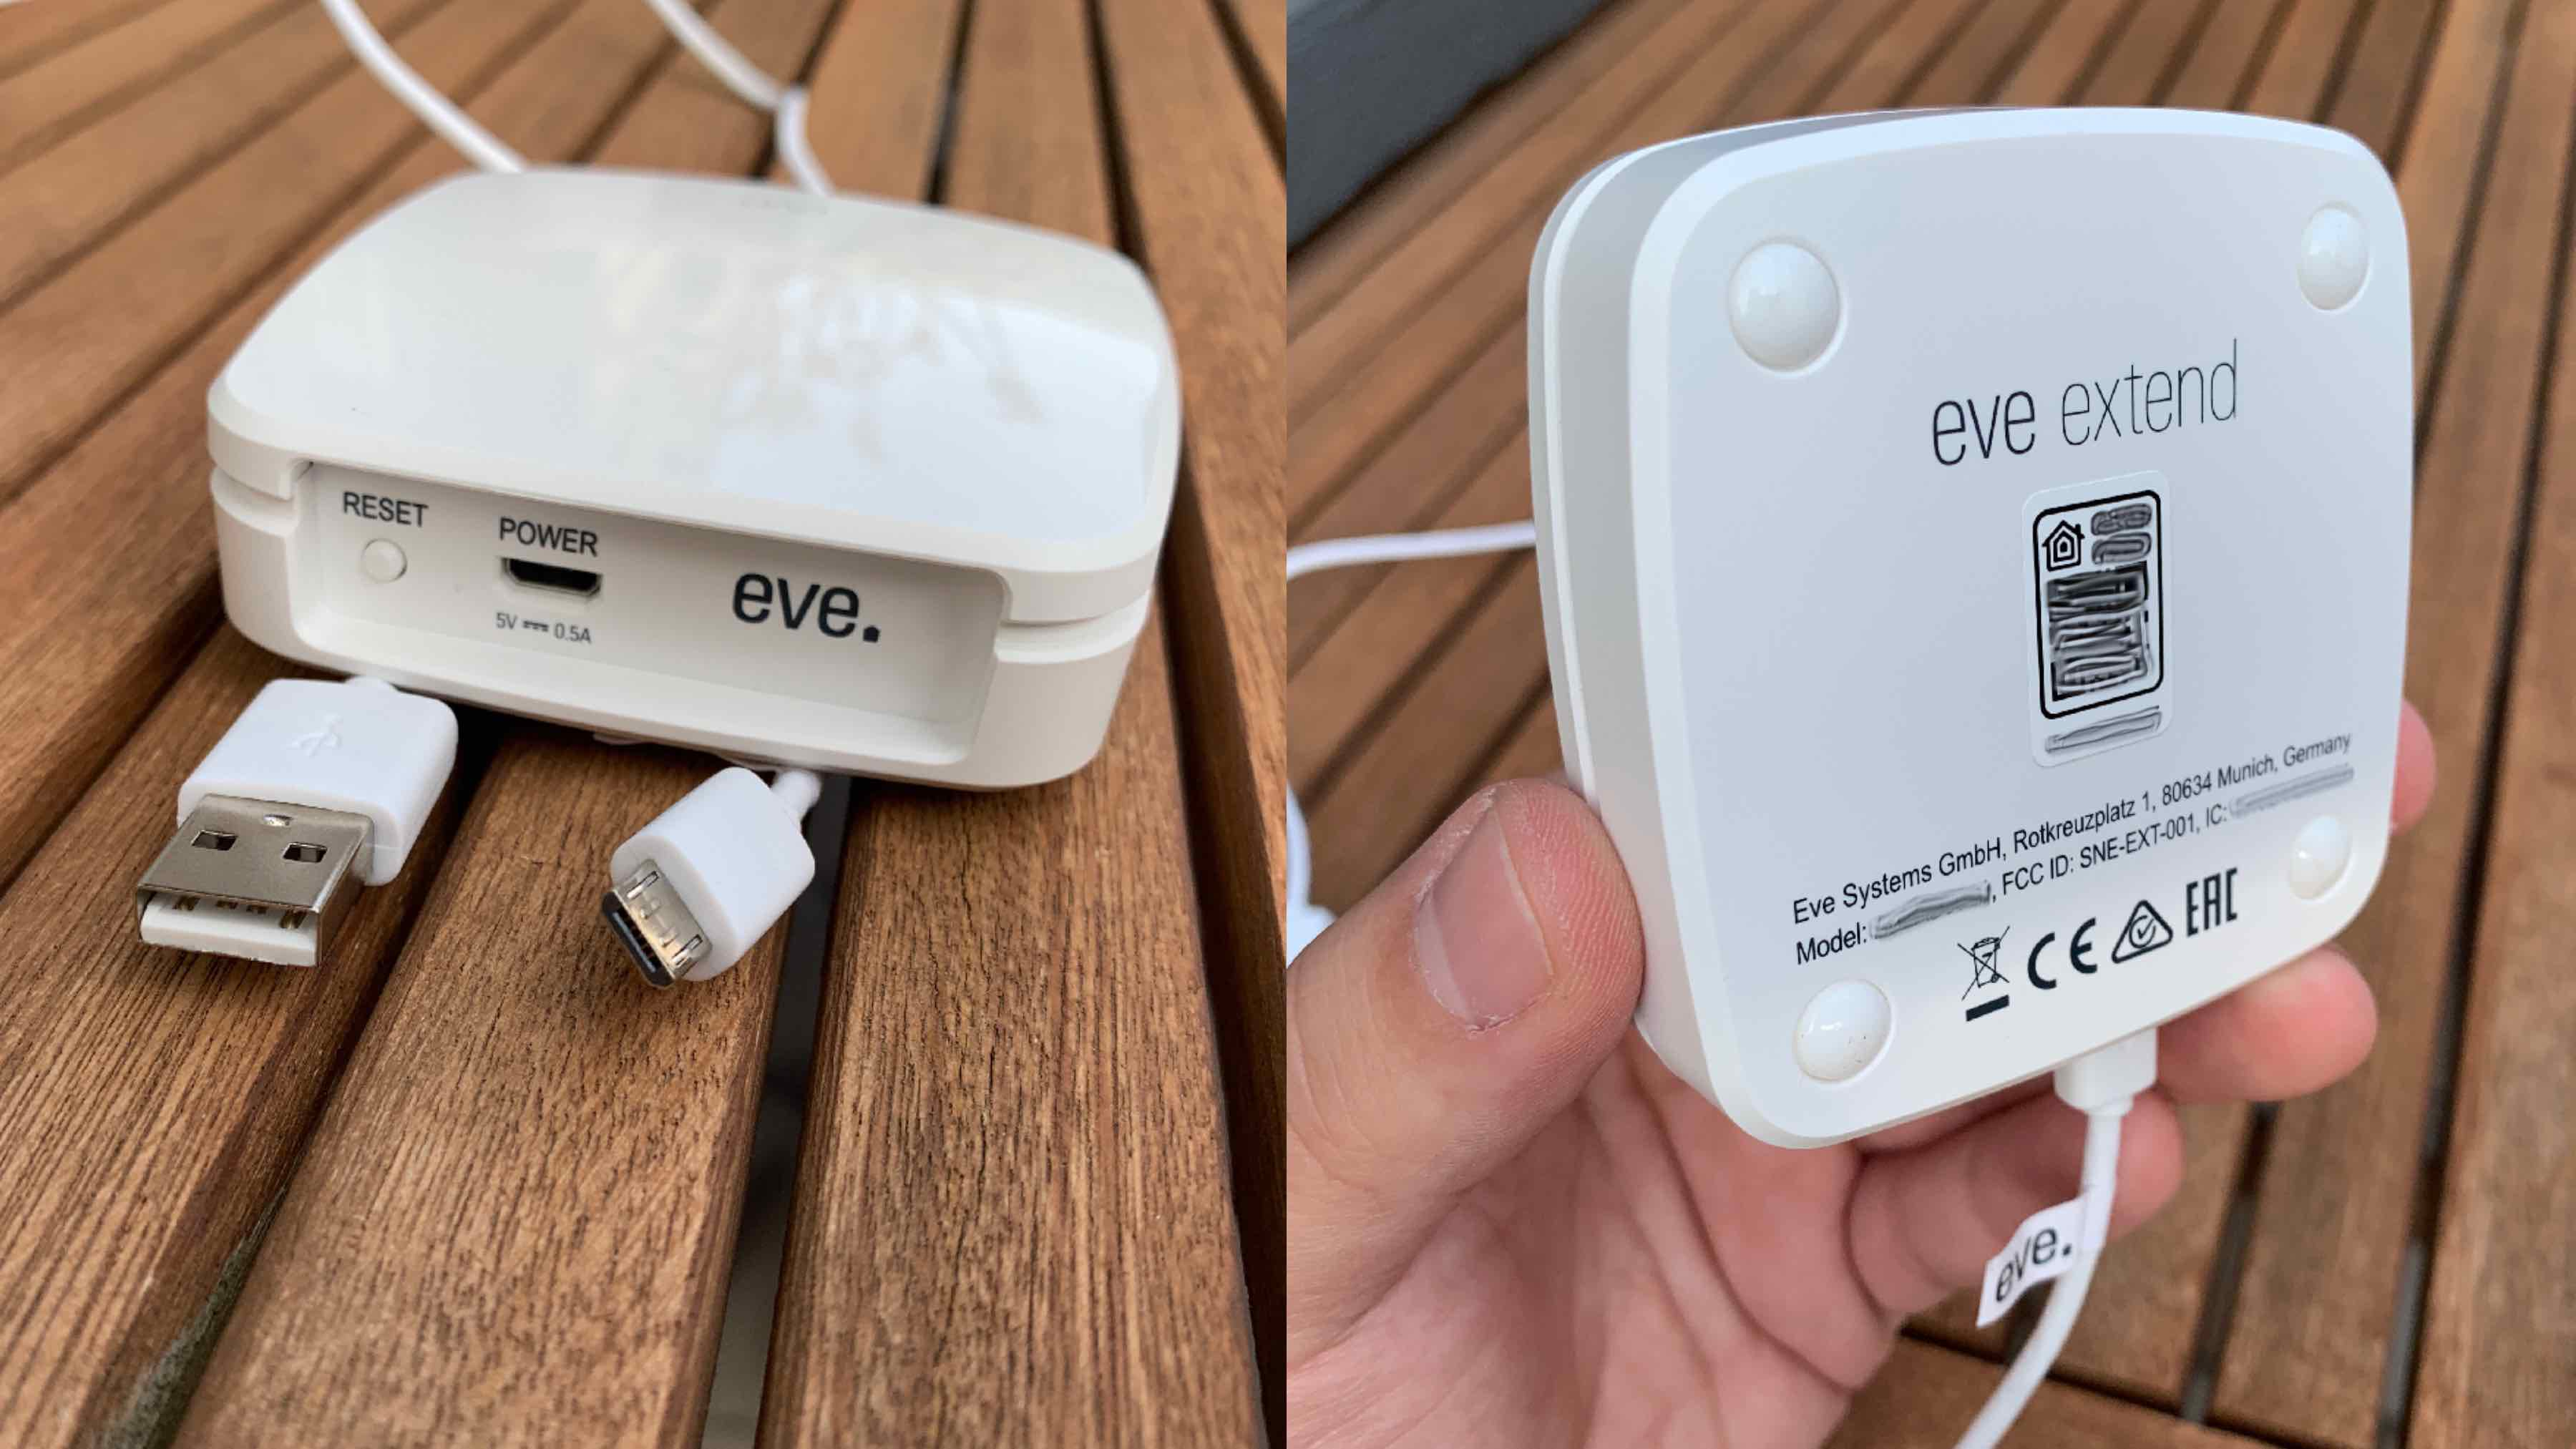 Eve_Extend_Bluetooth_Repeater_HomeKit_WiFi_WLAN_Gateway_Review1 Eve Extend von Eve - Bluetoothreichweite unter Apple HomeKit ins WiFi verlagern